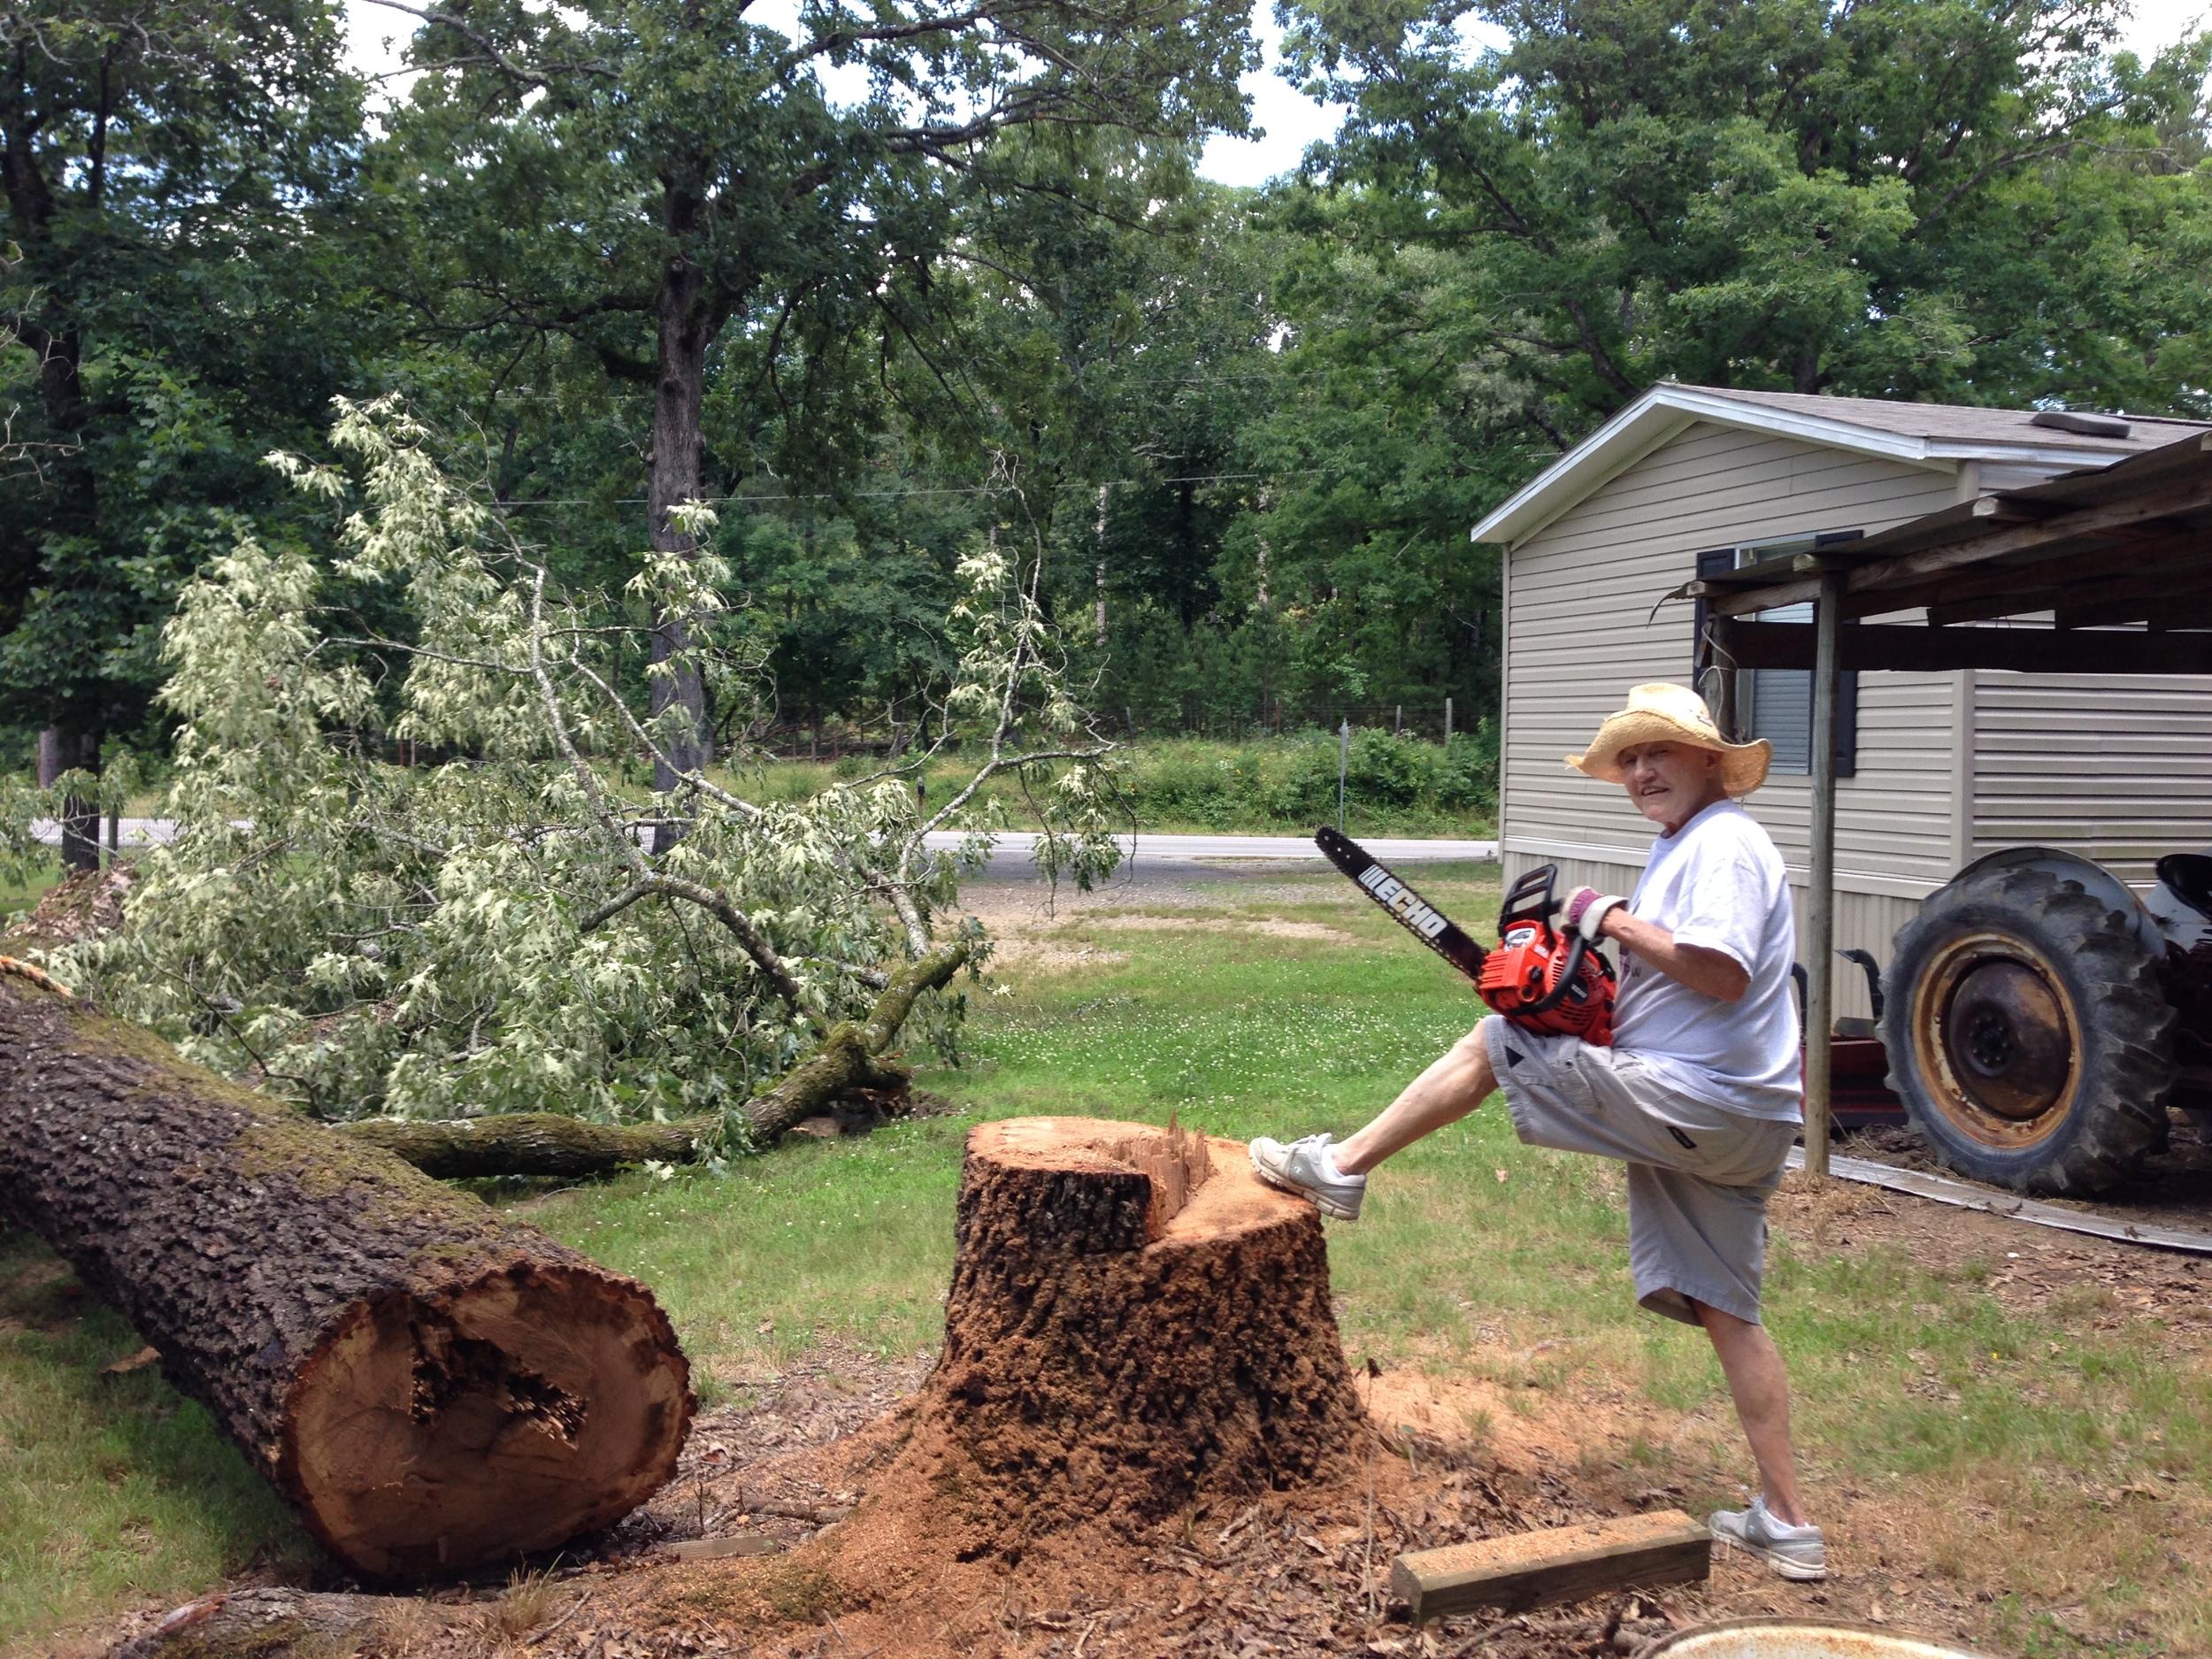 Aunt Linda cut down a tree!